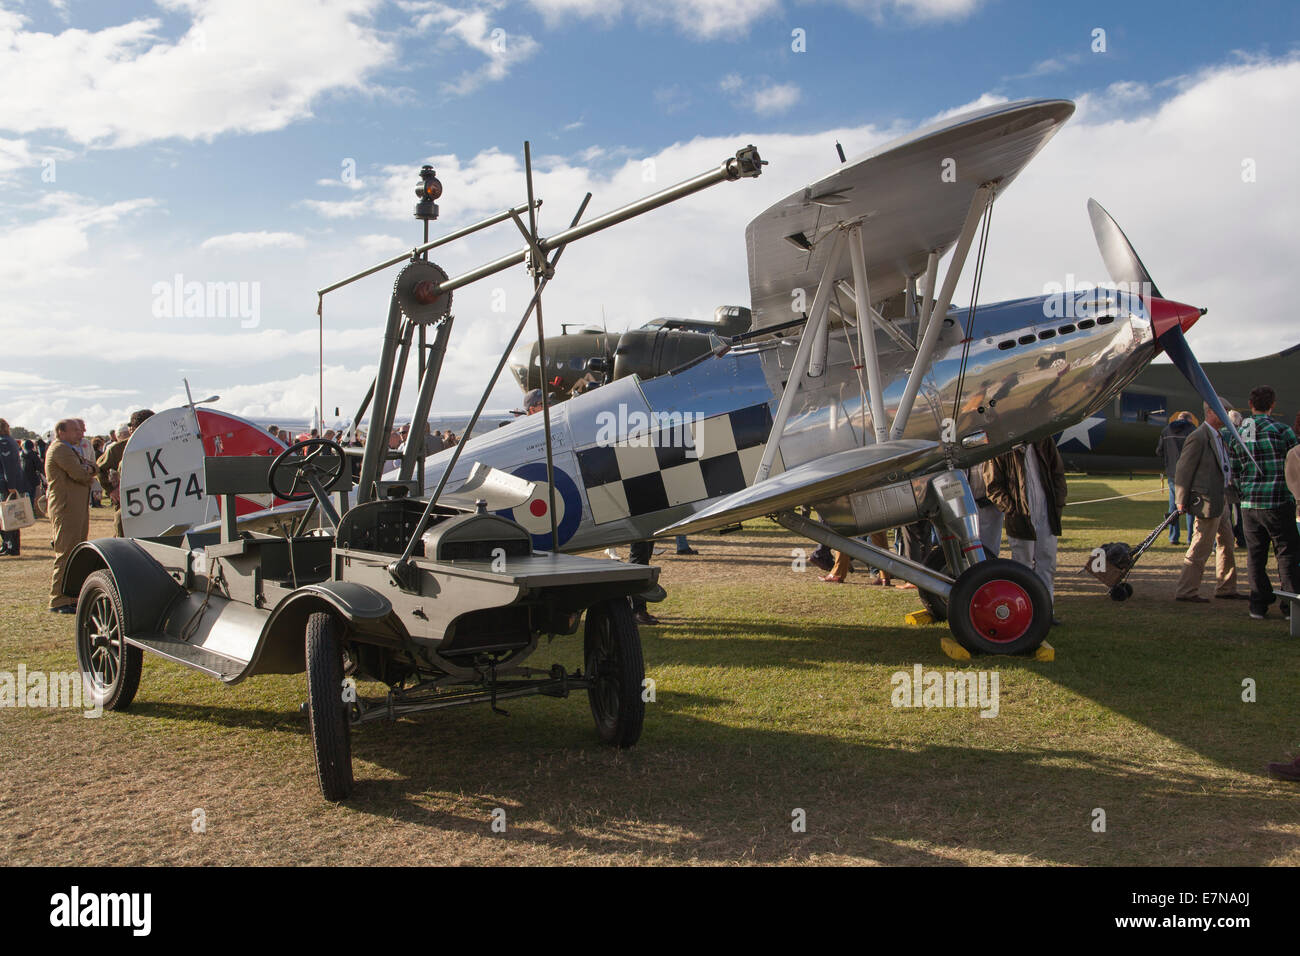 Silver bi plane - Stock Image